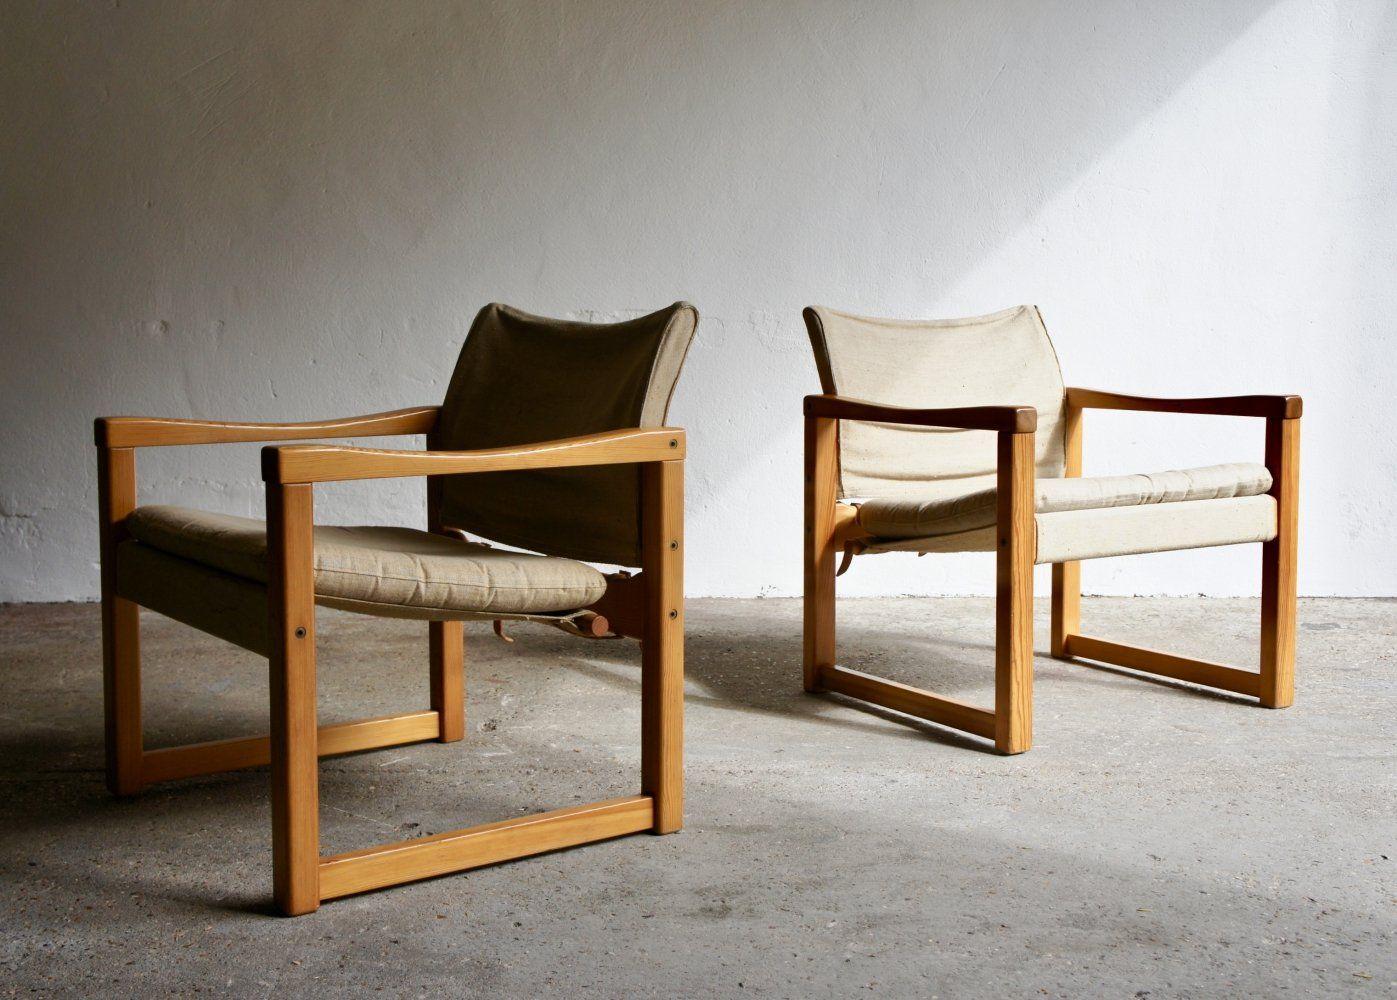 For Sale Pair Of Diana Safari Chairs By Karin Mobring Safari Chair Chair Home Decor